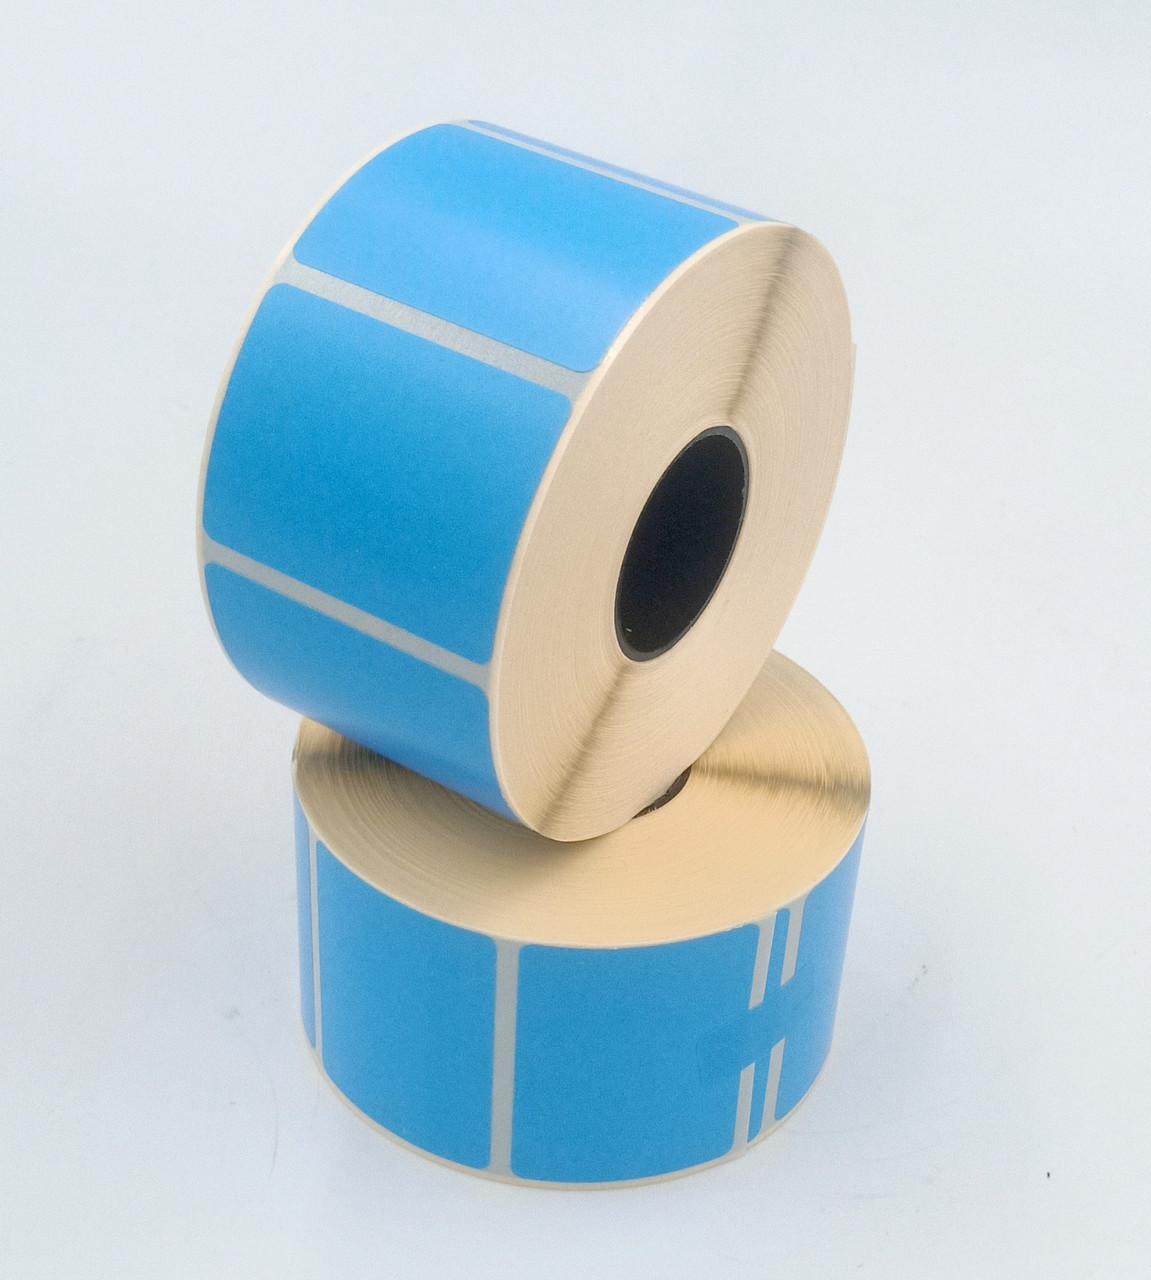 Mobitehnika Термоетикетка для весов, етикеточних принтерів Т.Еко пантон синя 40*25 1000шт вт. 25мм